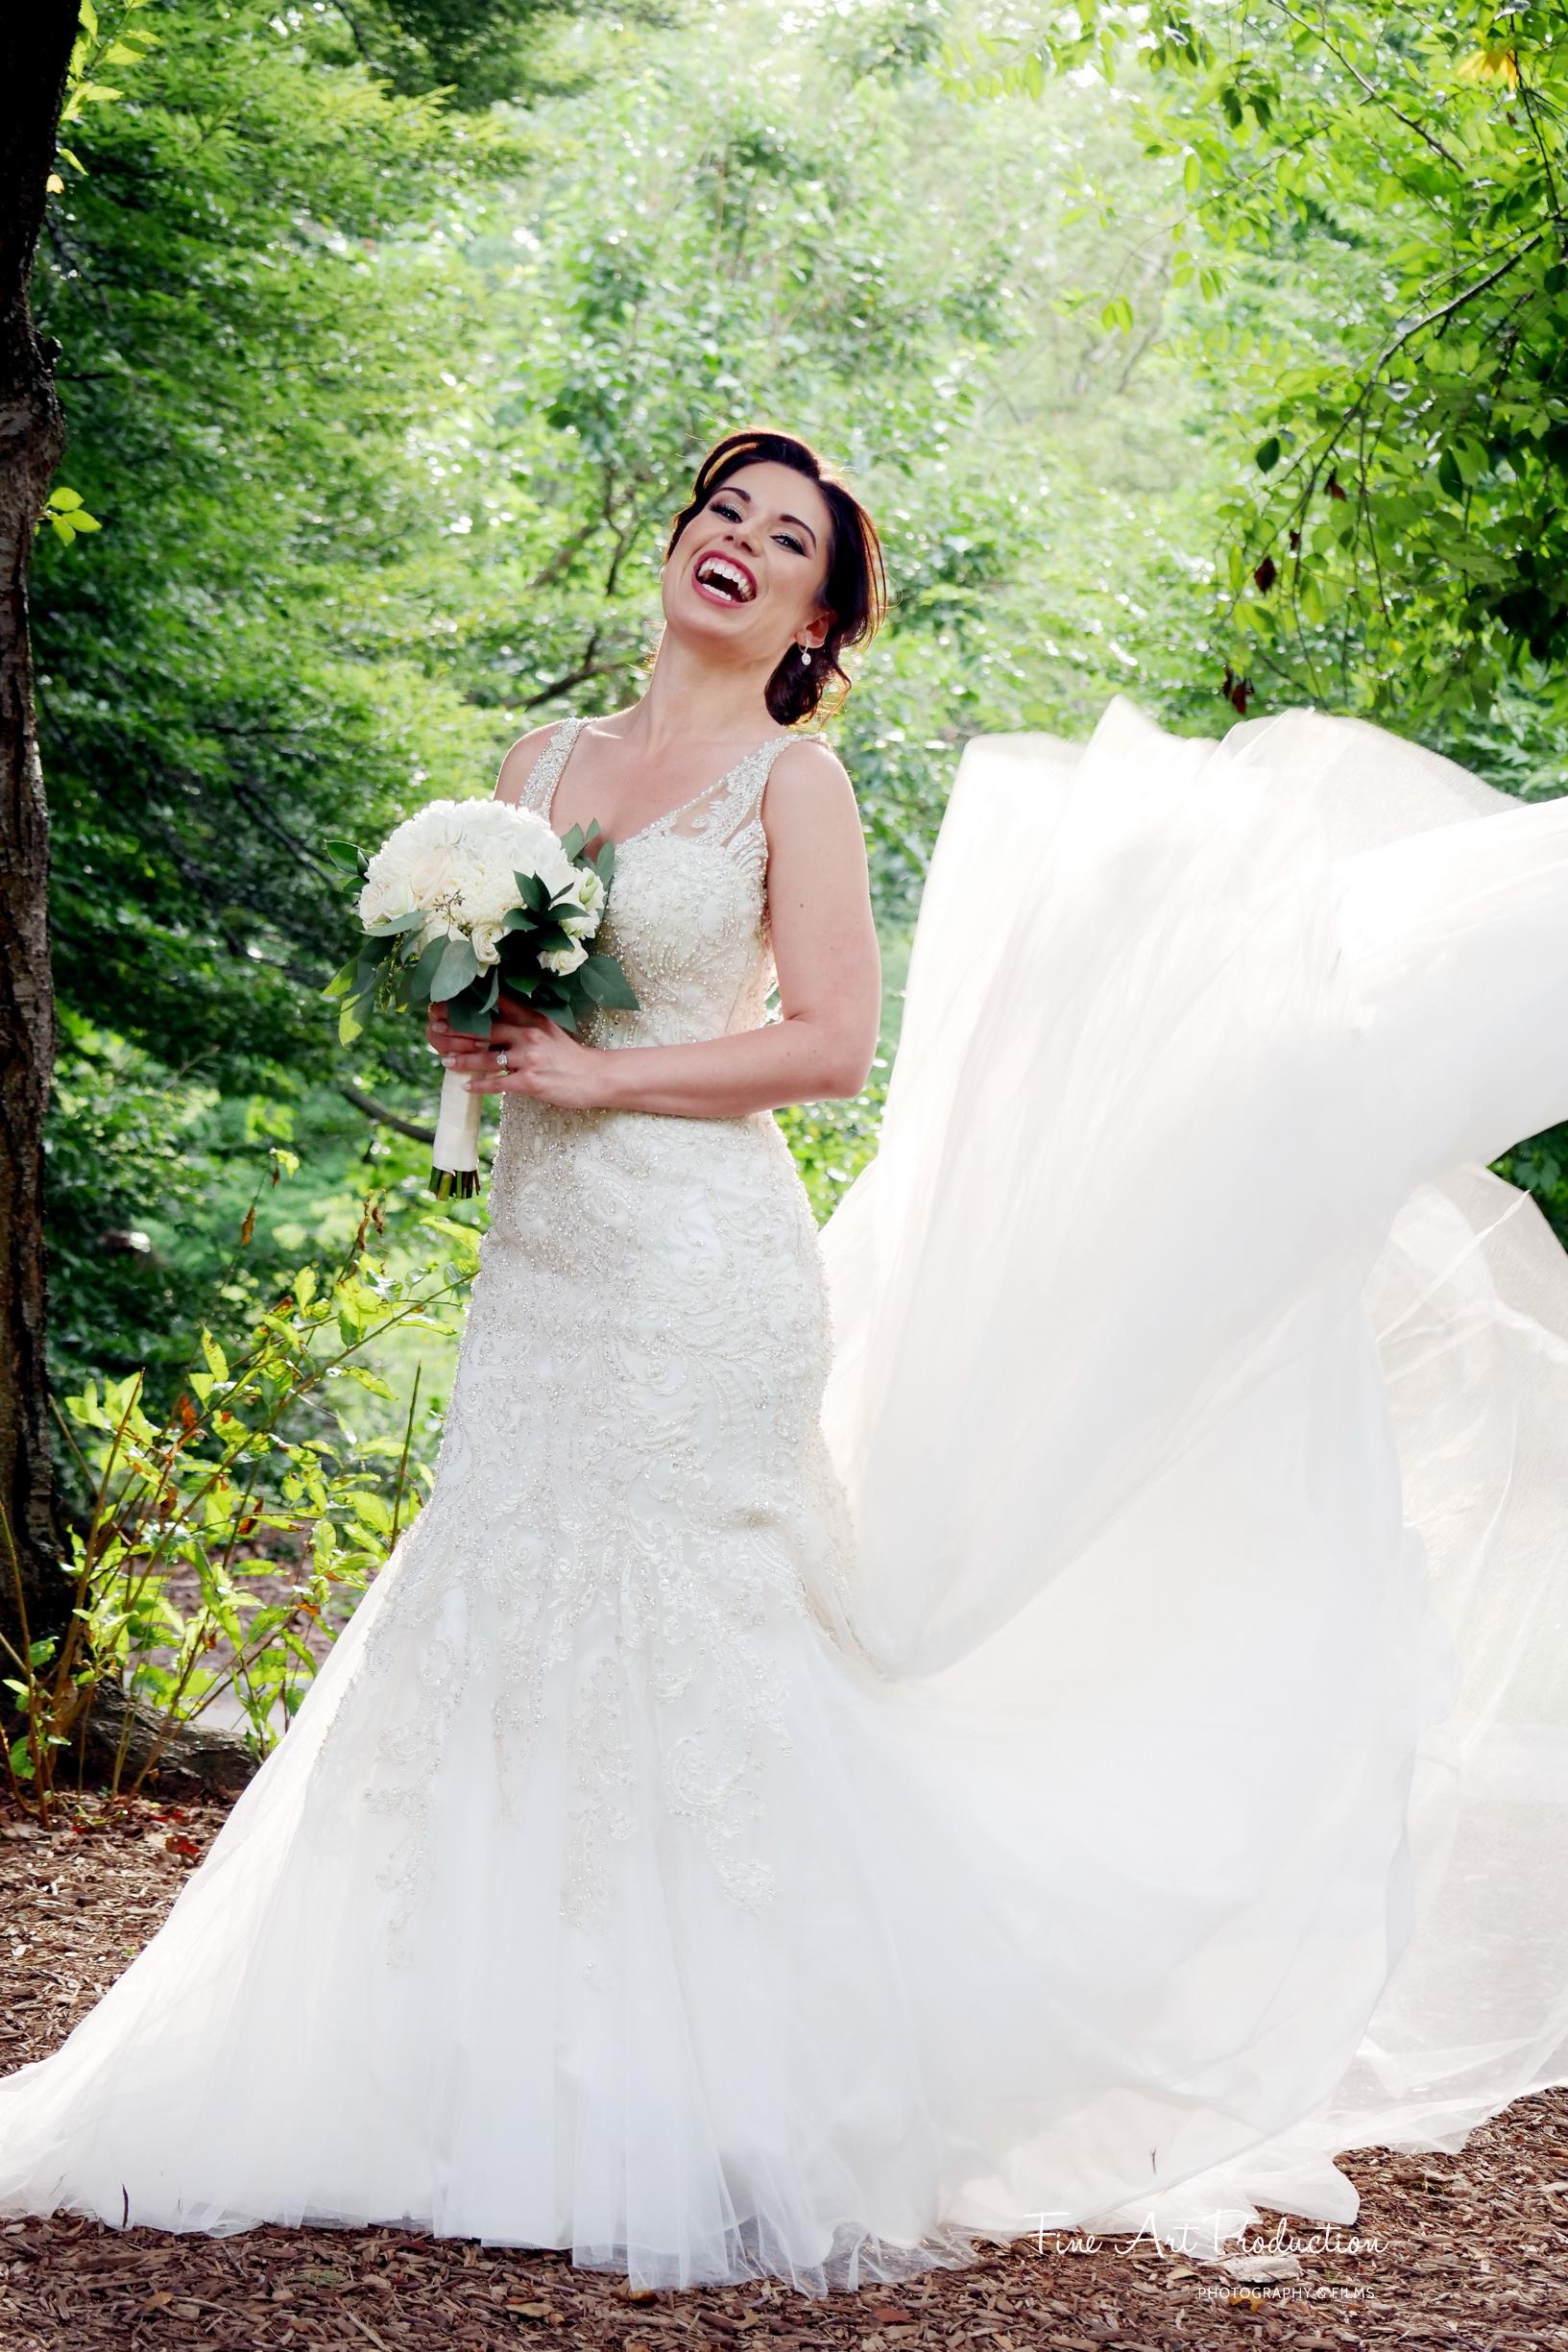 india-wedding-photographer-fine-art-production-chirali-amish-thakkar_0110